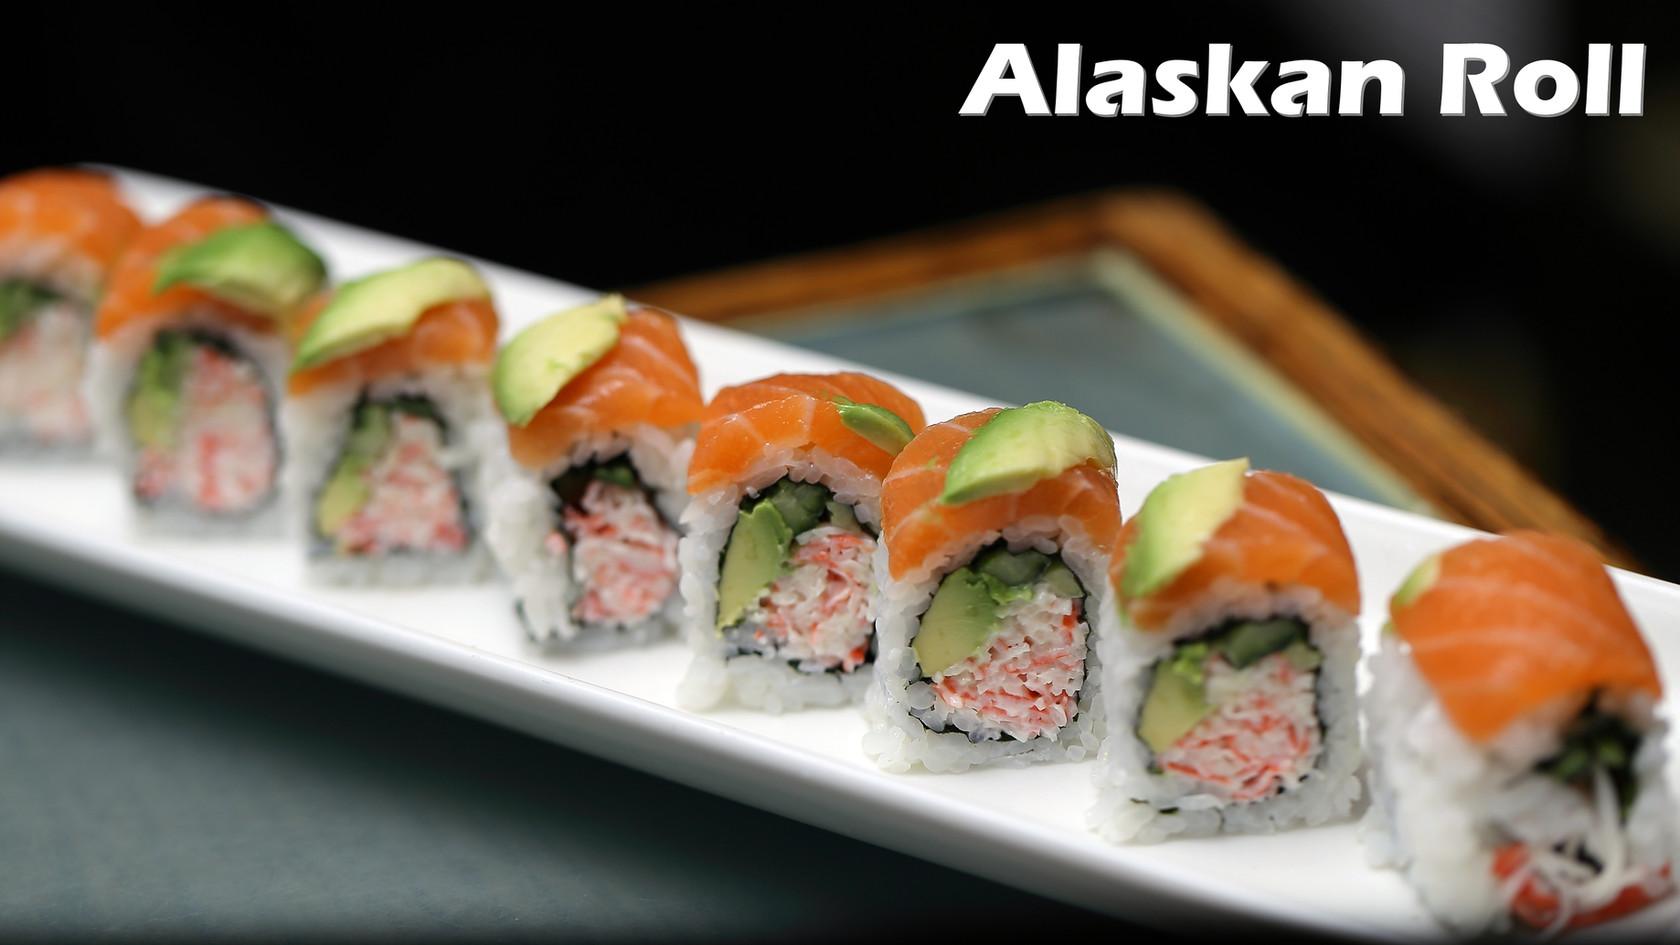 Alaskan Roll 02.JPG